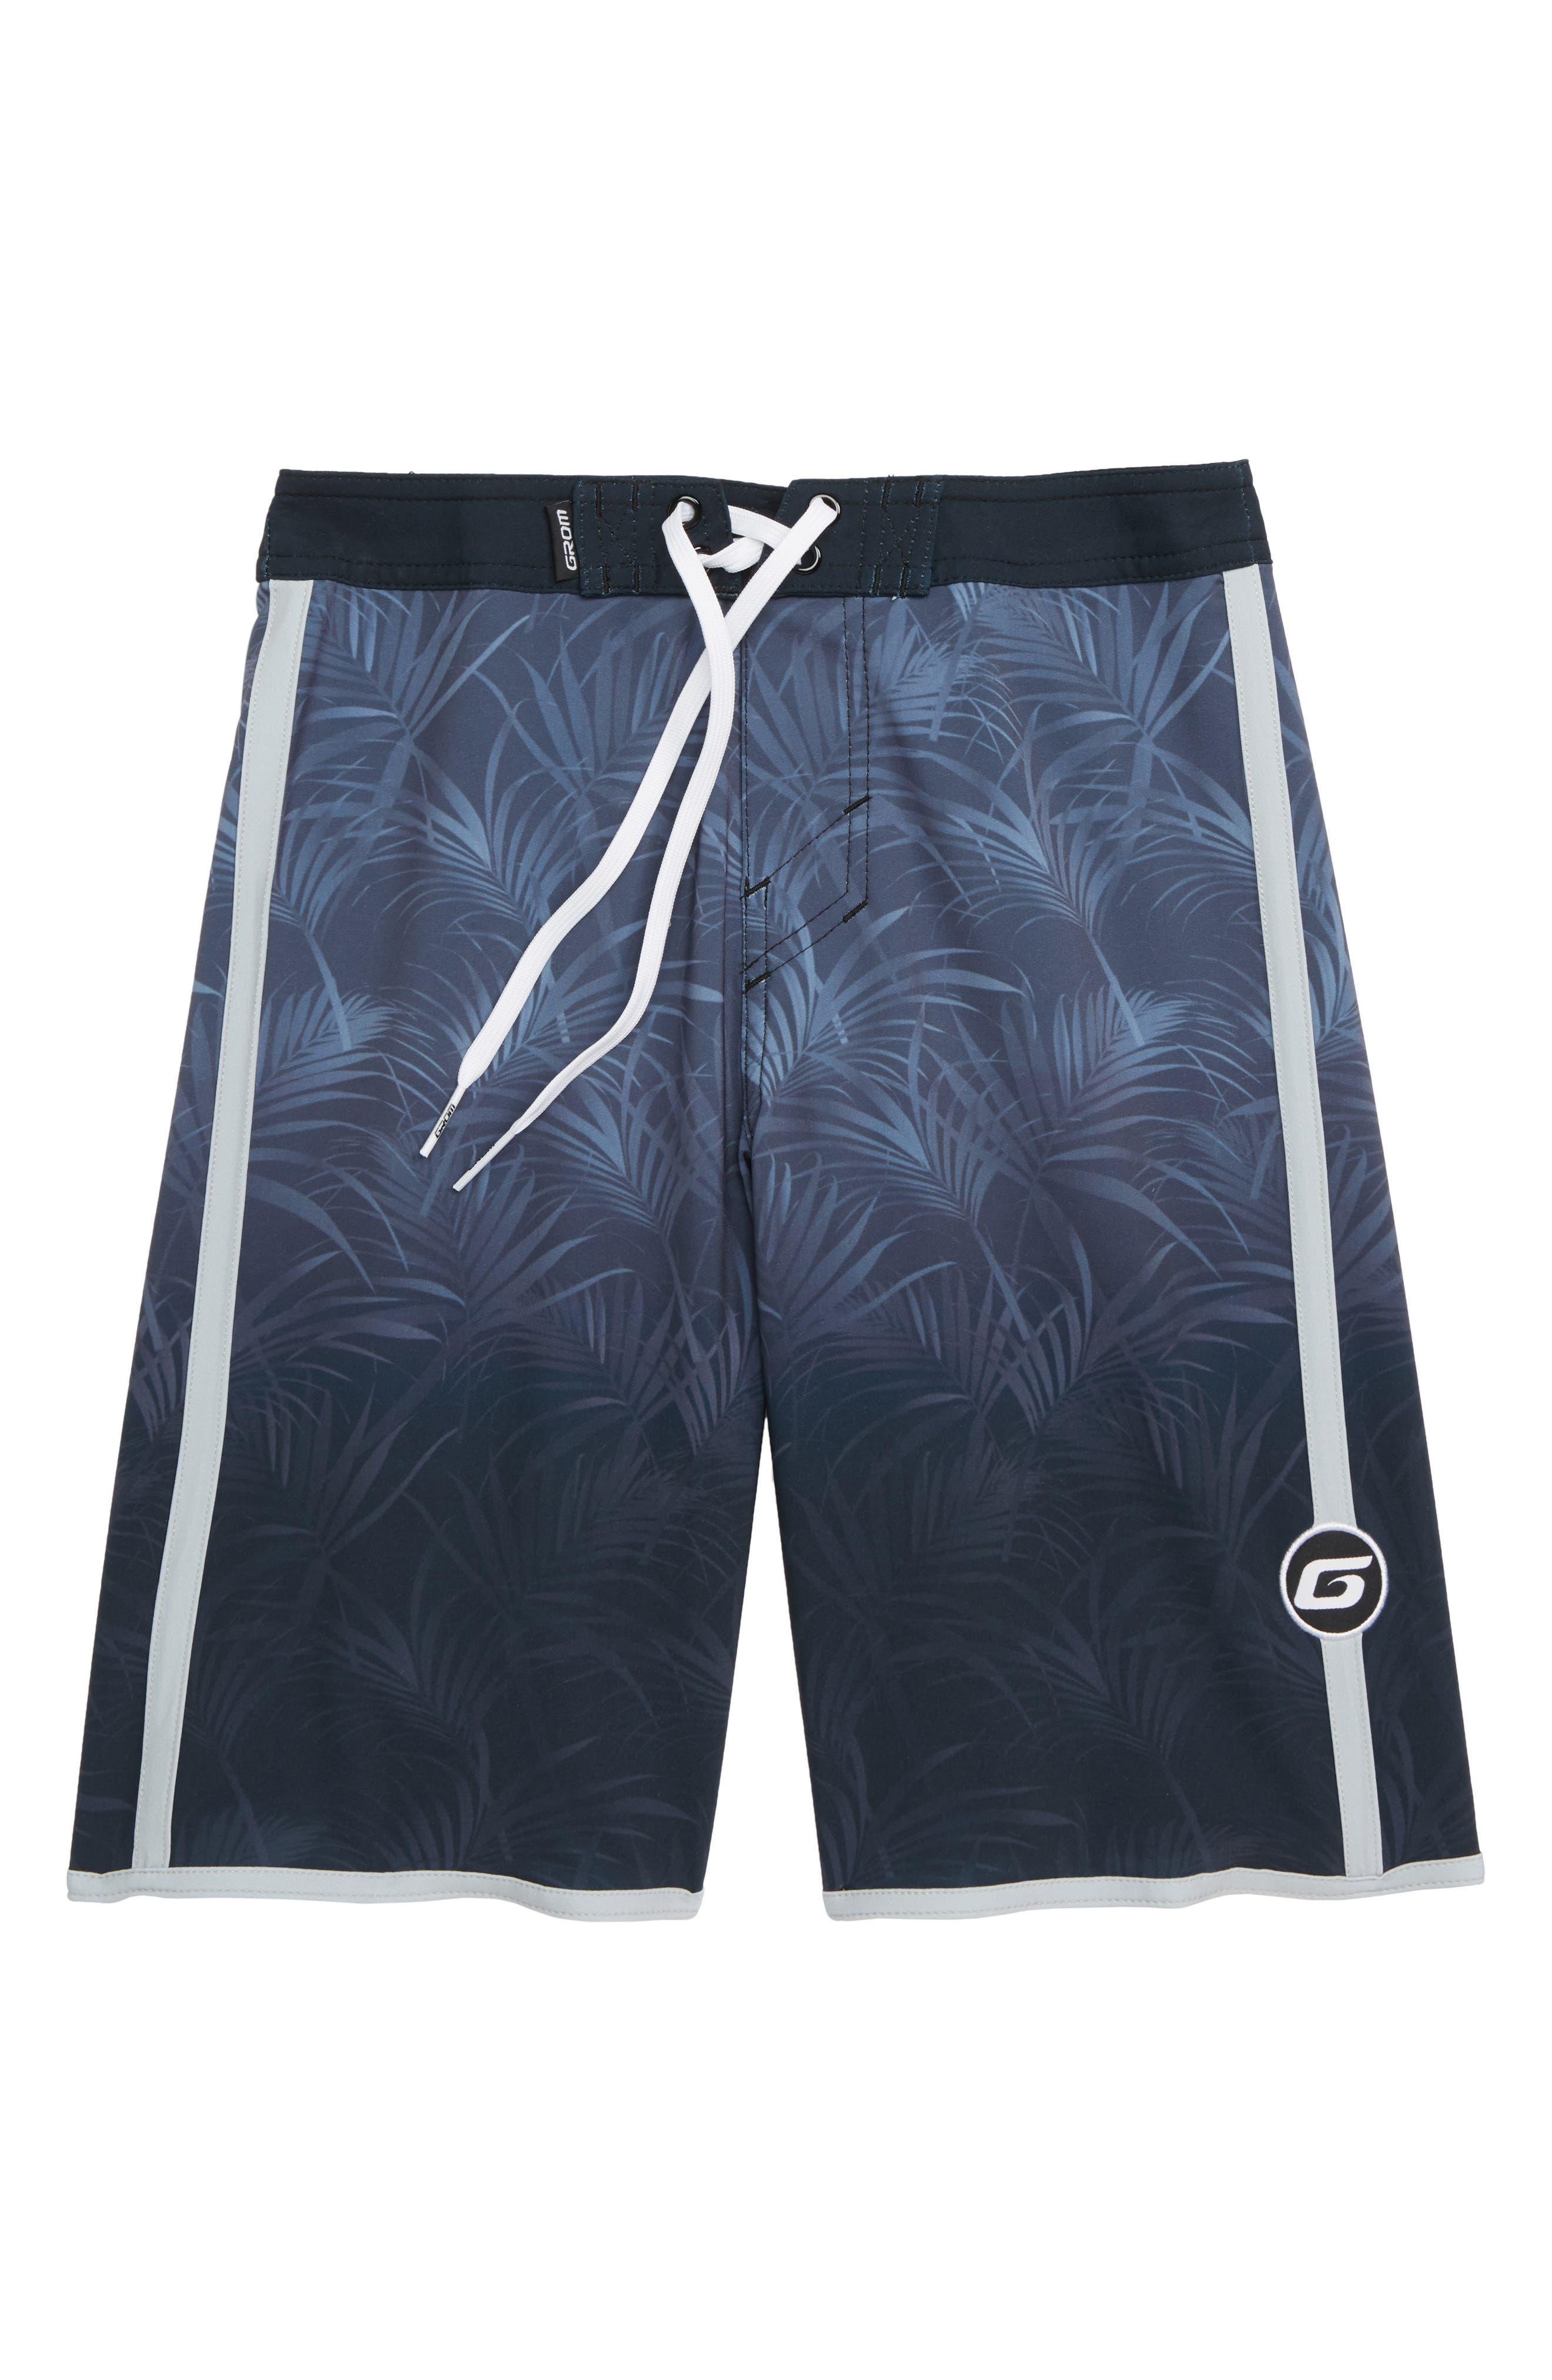 Palm Fade Board Shorts,                         Main,                         color, BLACK